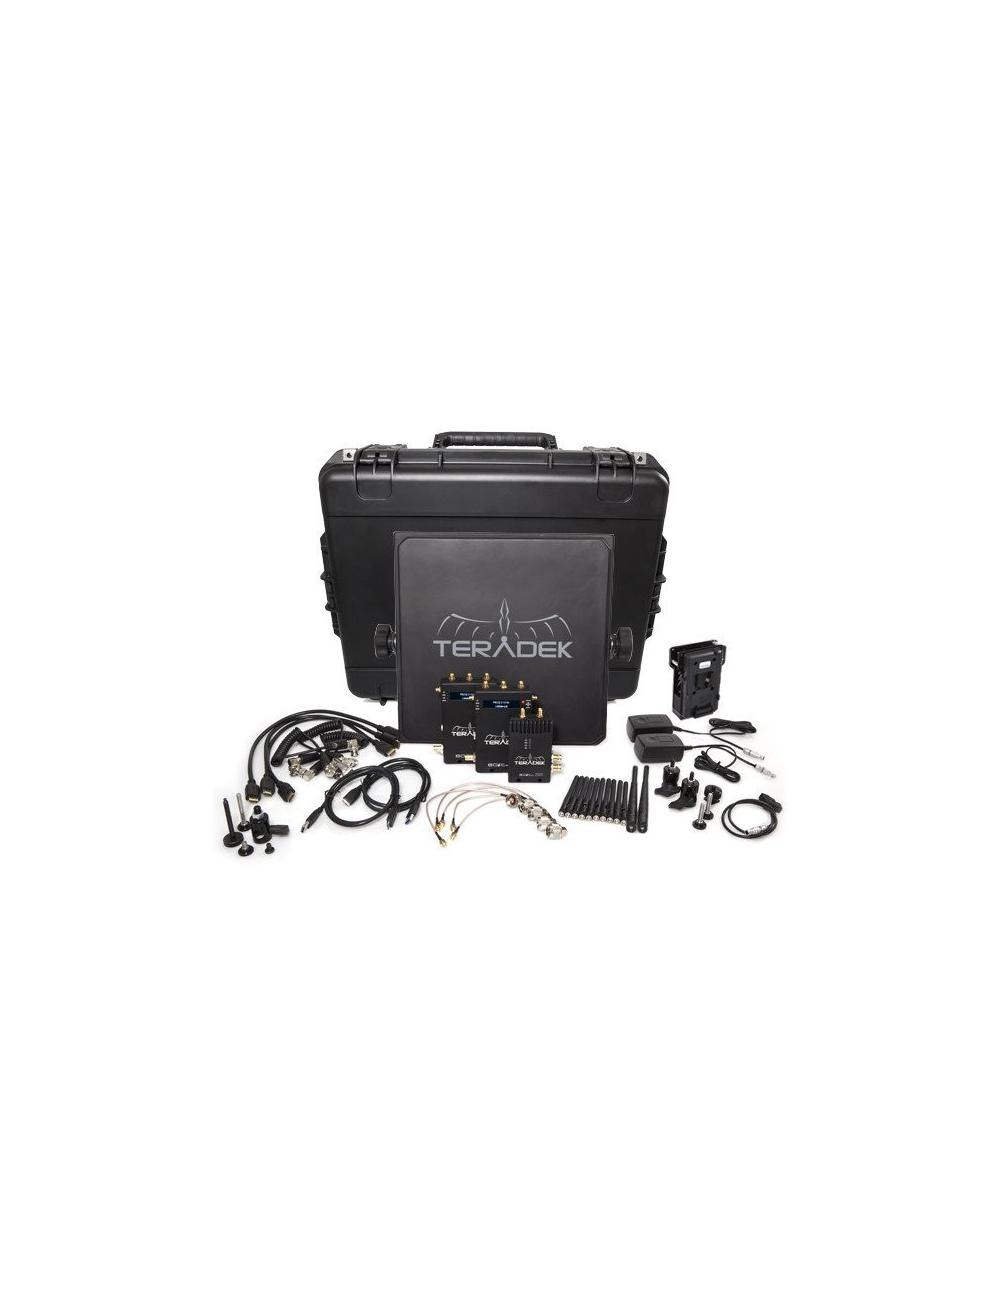 Teradek Bolt Pro 1000 TX/2RX Deluxe SDI/HDMI V-MOUNT